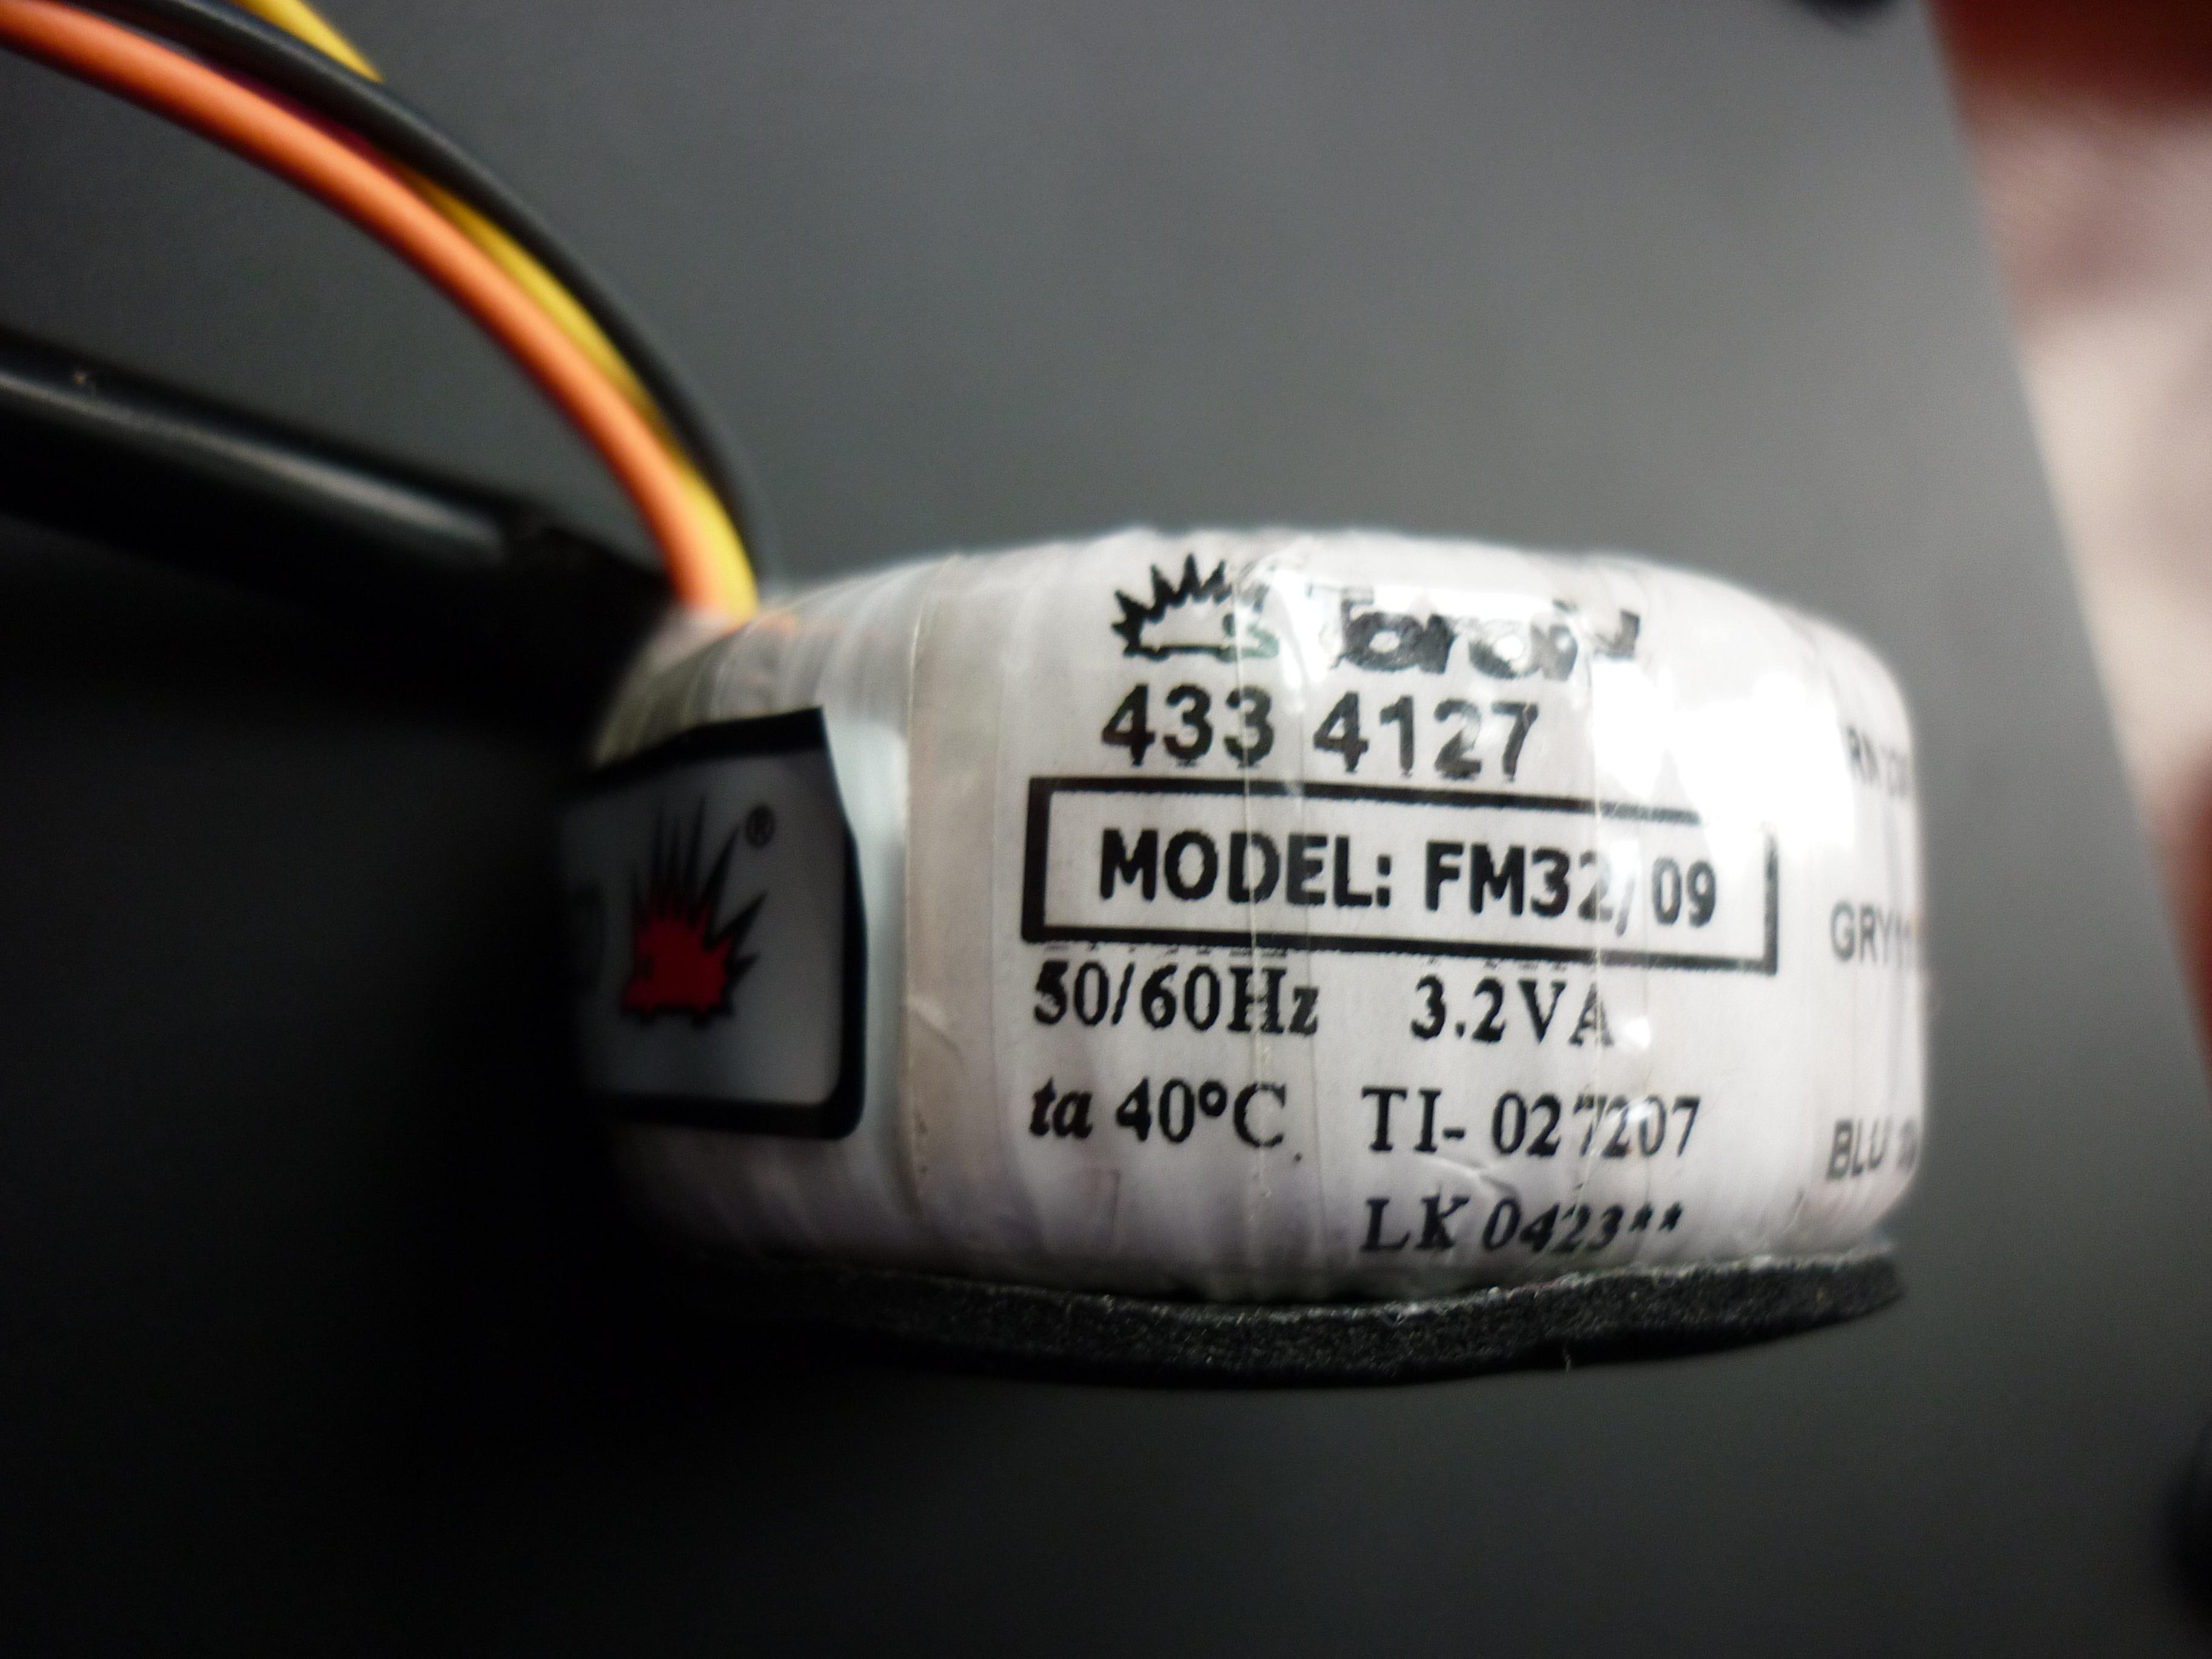 Electro Harmonix 12ay7 Mic Pre Amp Modifications Gearslutz Circuit Microphone Diagram New Transformer Eh